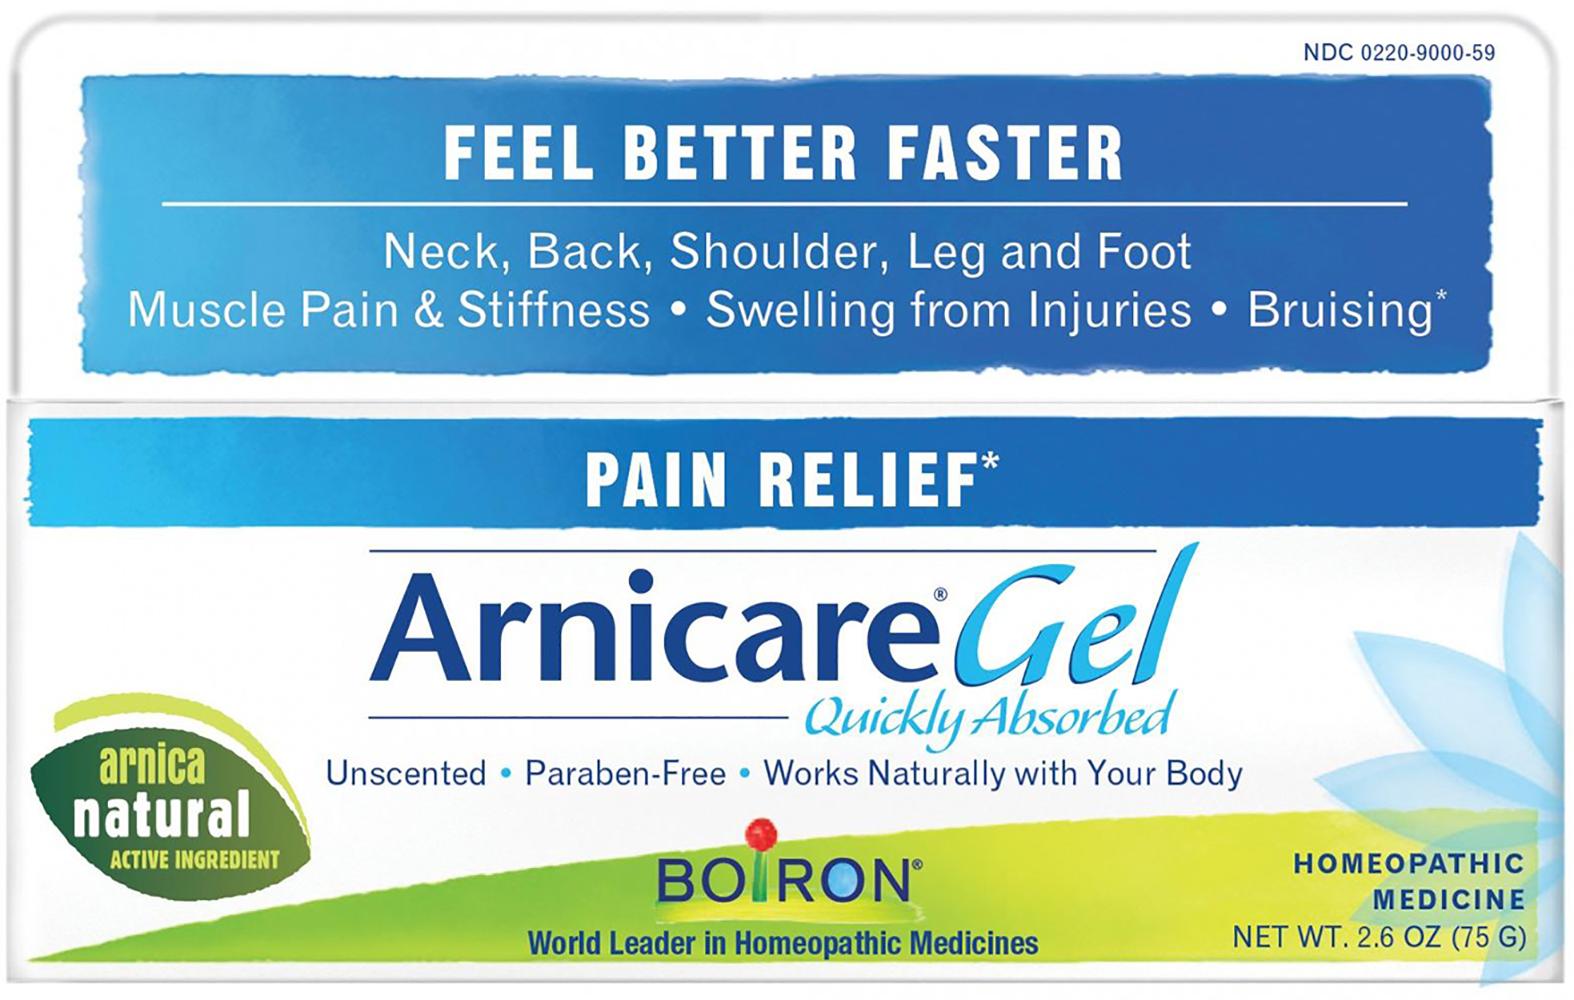 Boiron Arnicare arnica gel